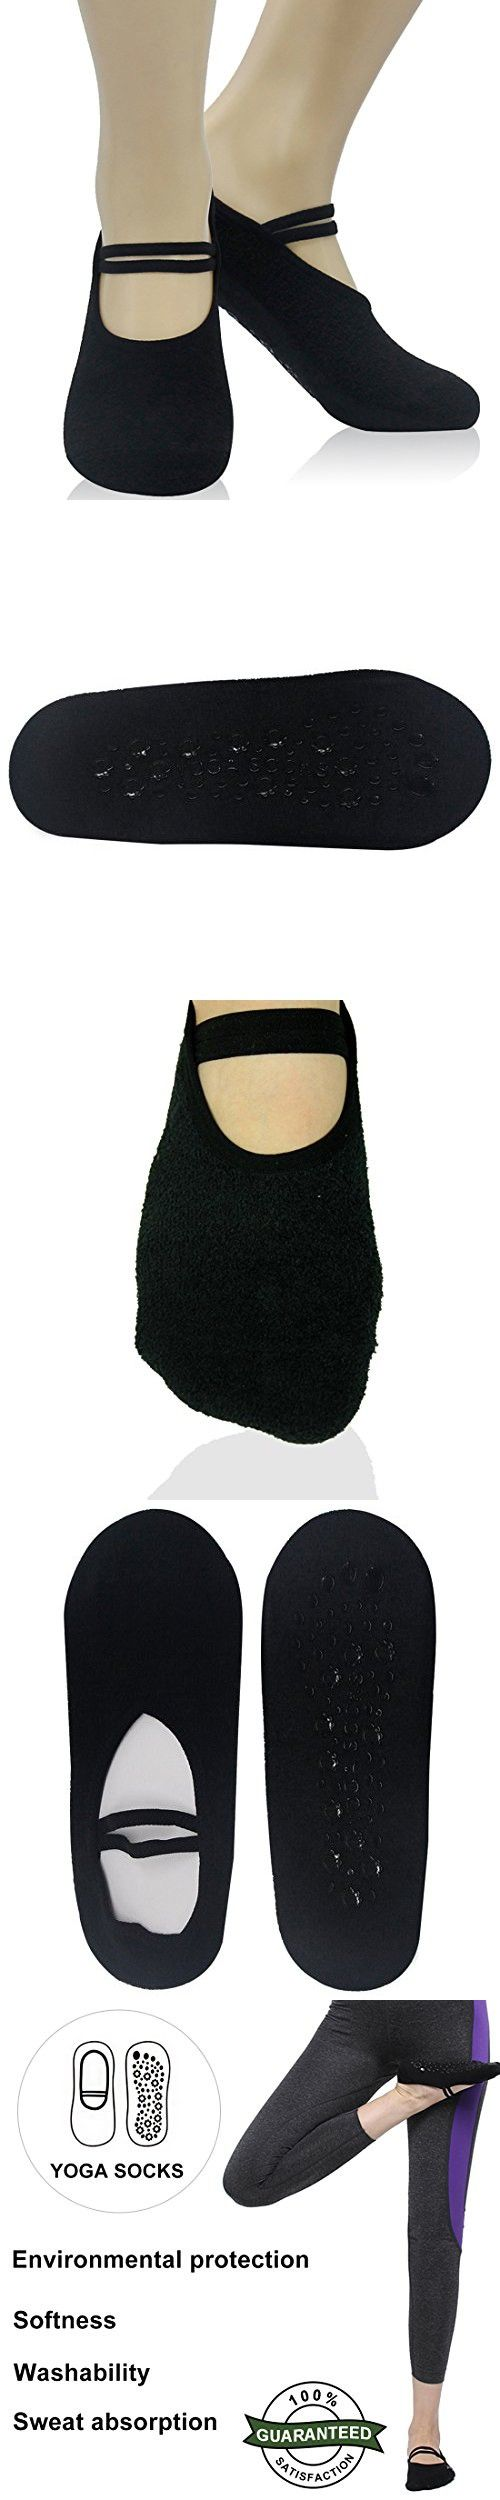 Womens Socks Non Skid, Forfoot Bellarina Grip Non-Slip for Ballet,Yoga,Pilates,Barre Toe Socks Women Shoes Size 6-10 Black 1 Pairs